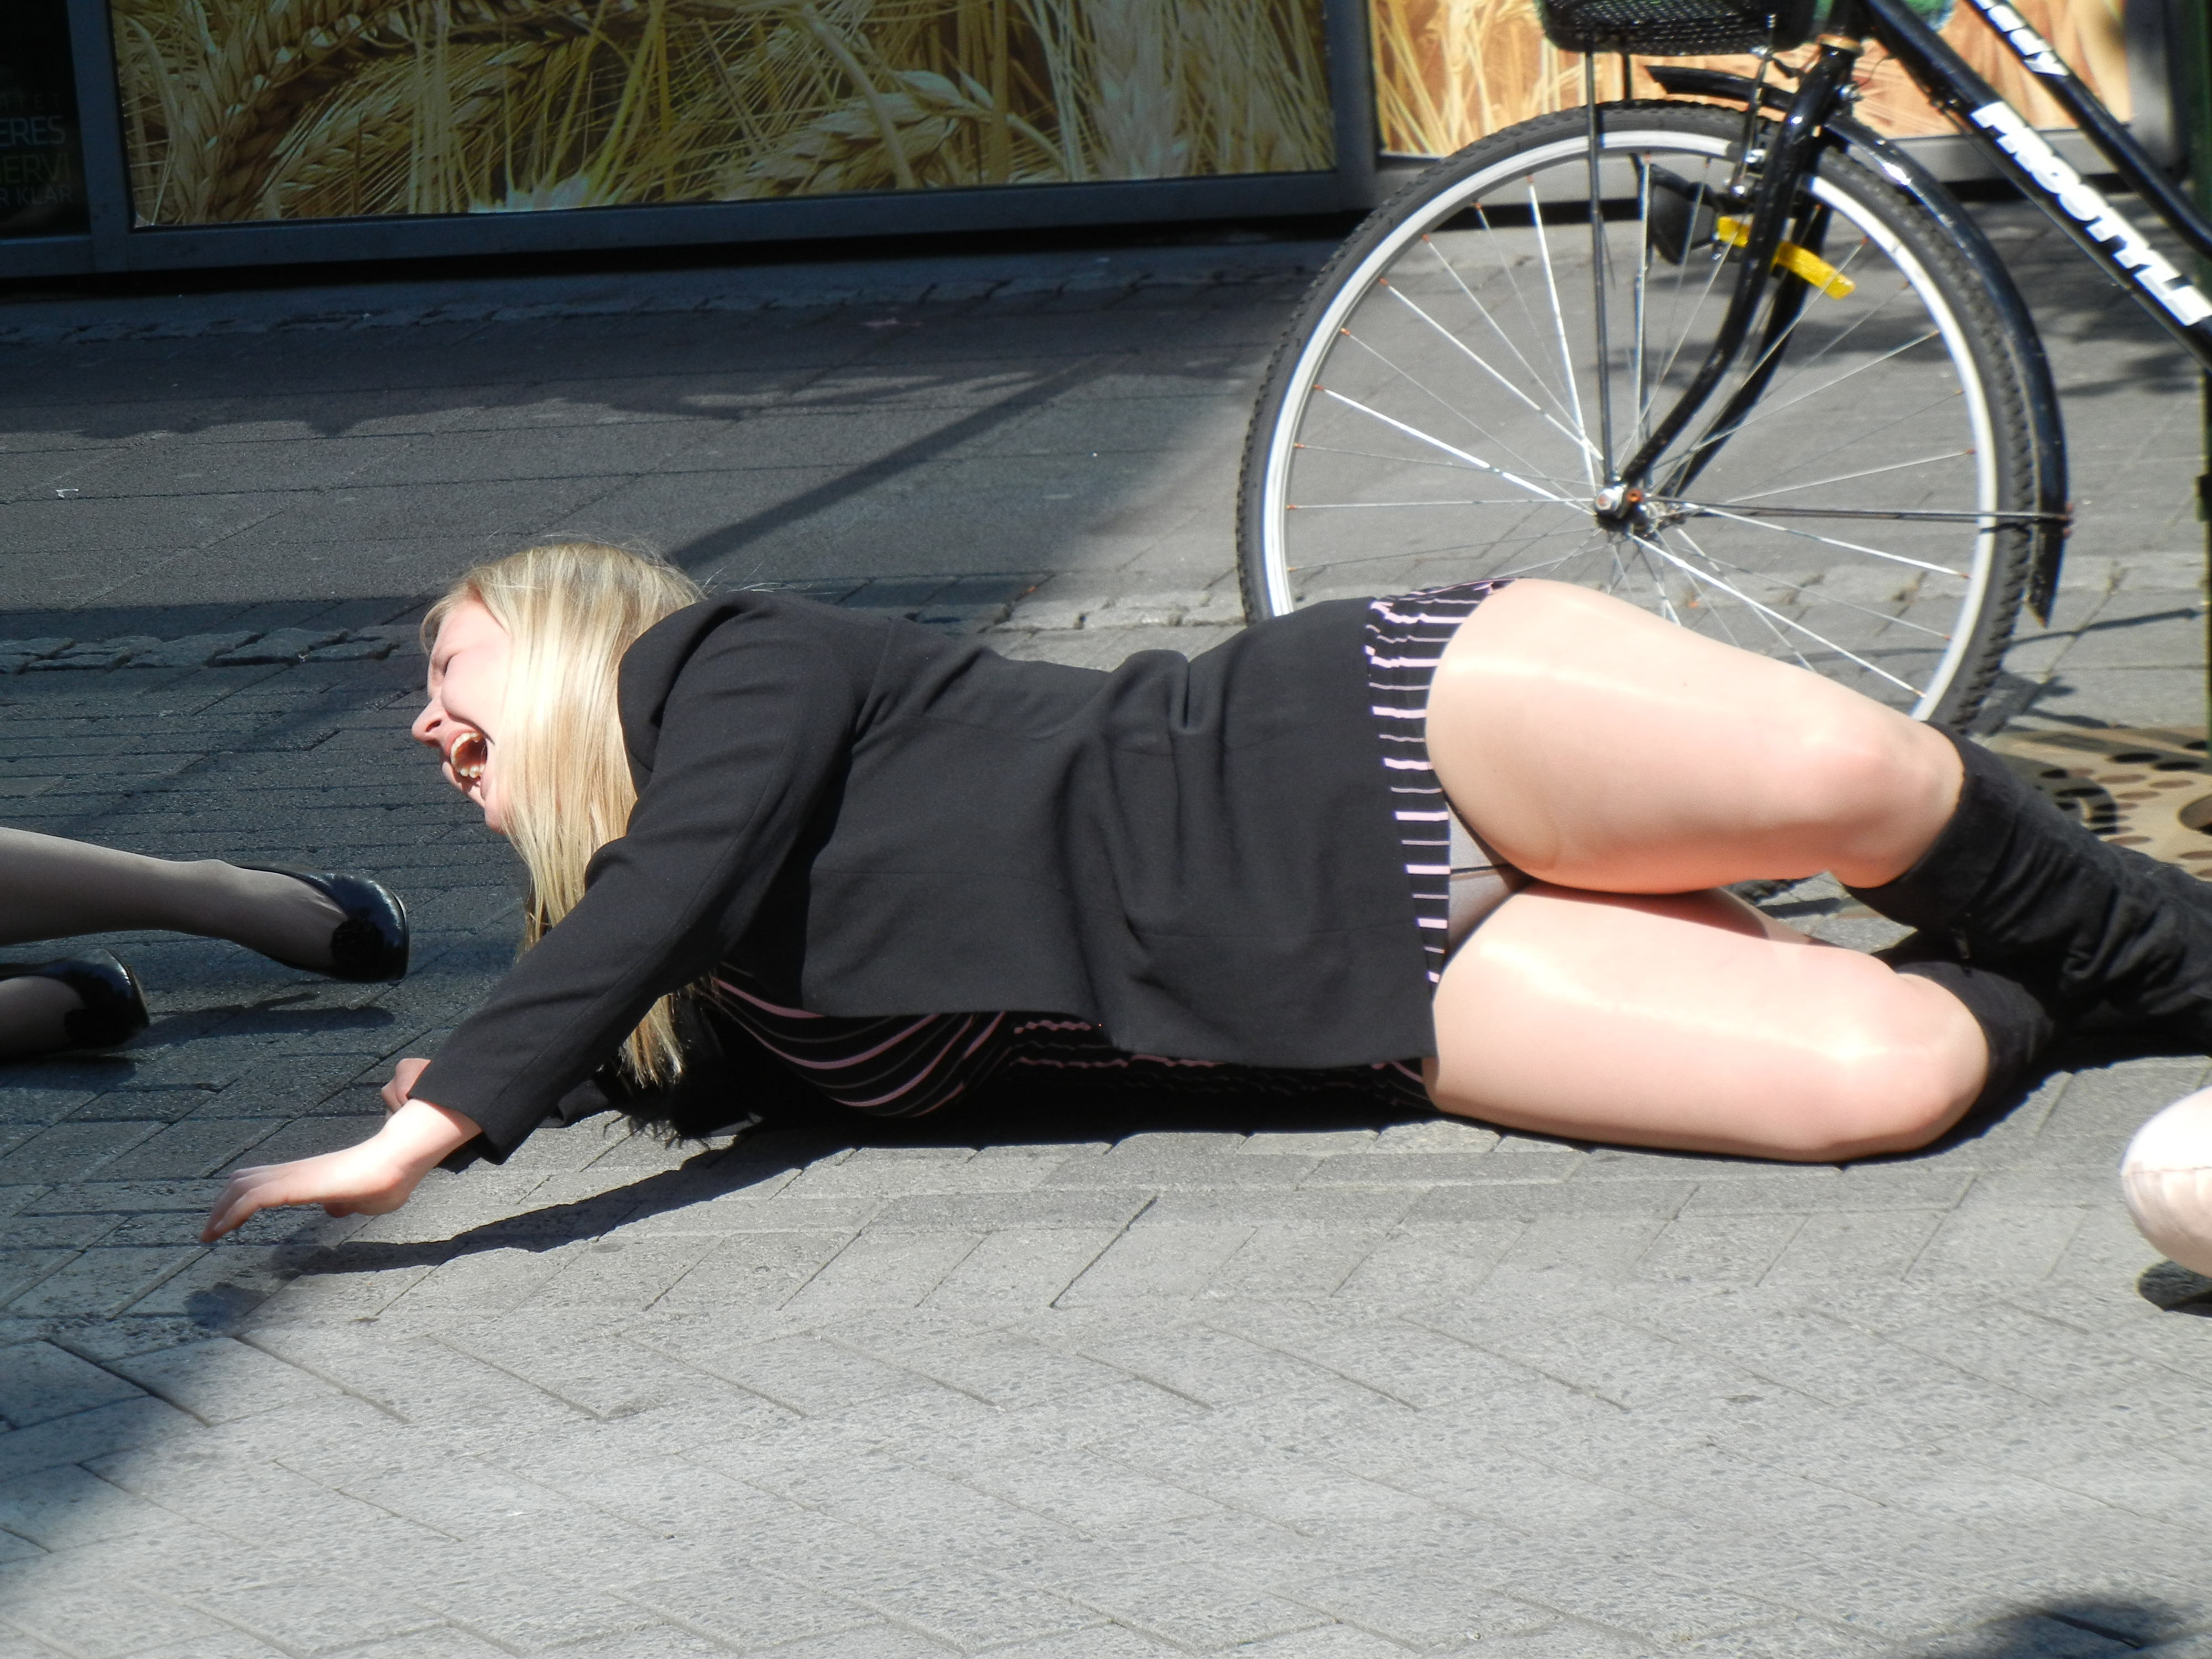 Black woman riding sex pix pron photo